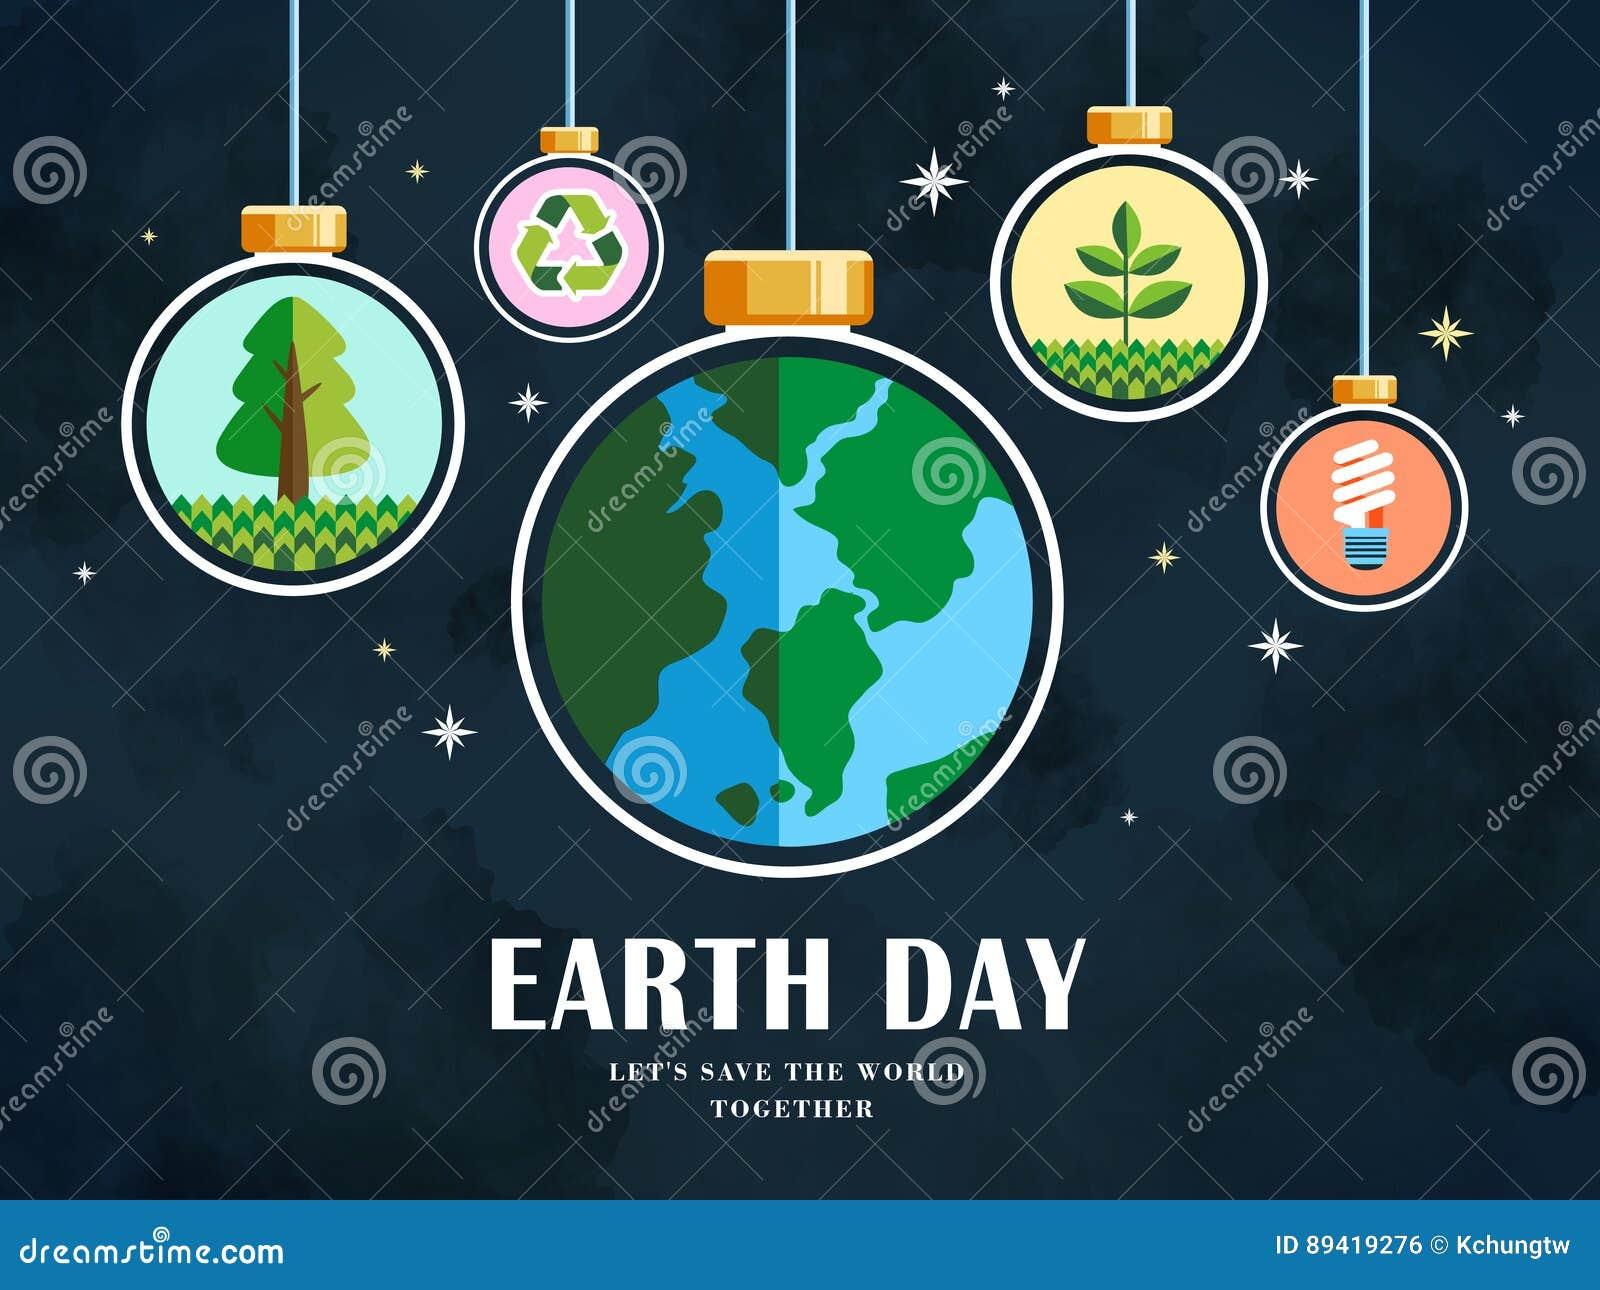 Earth Day Illustration Stock Vector Illustration Of Green 89419276